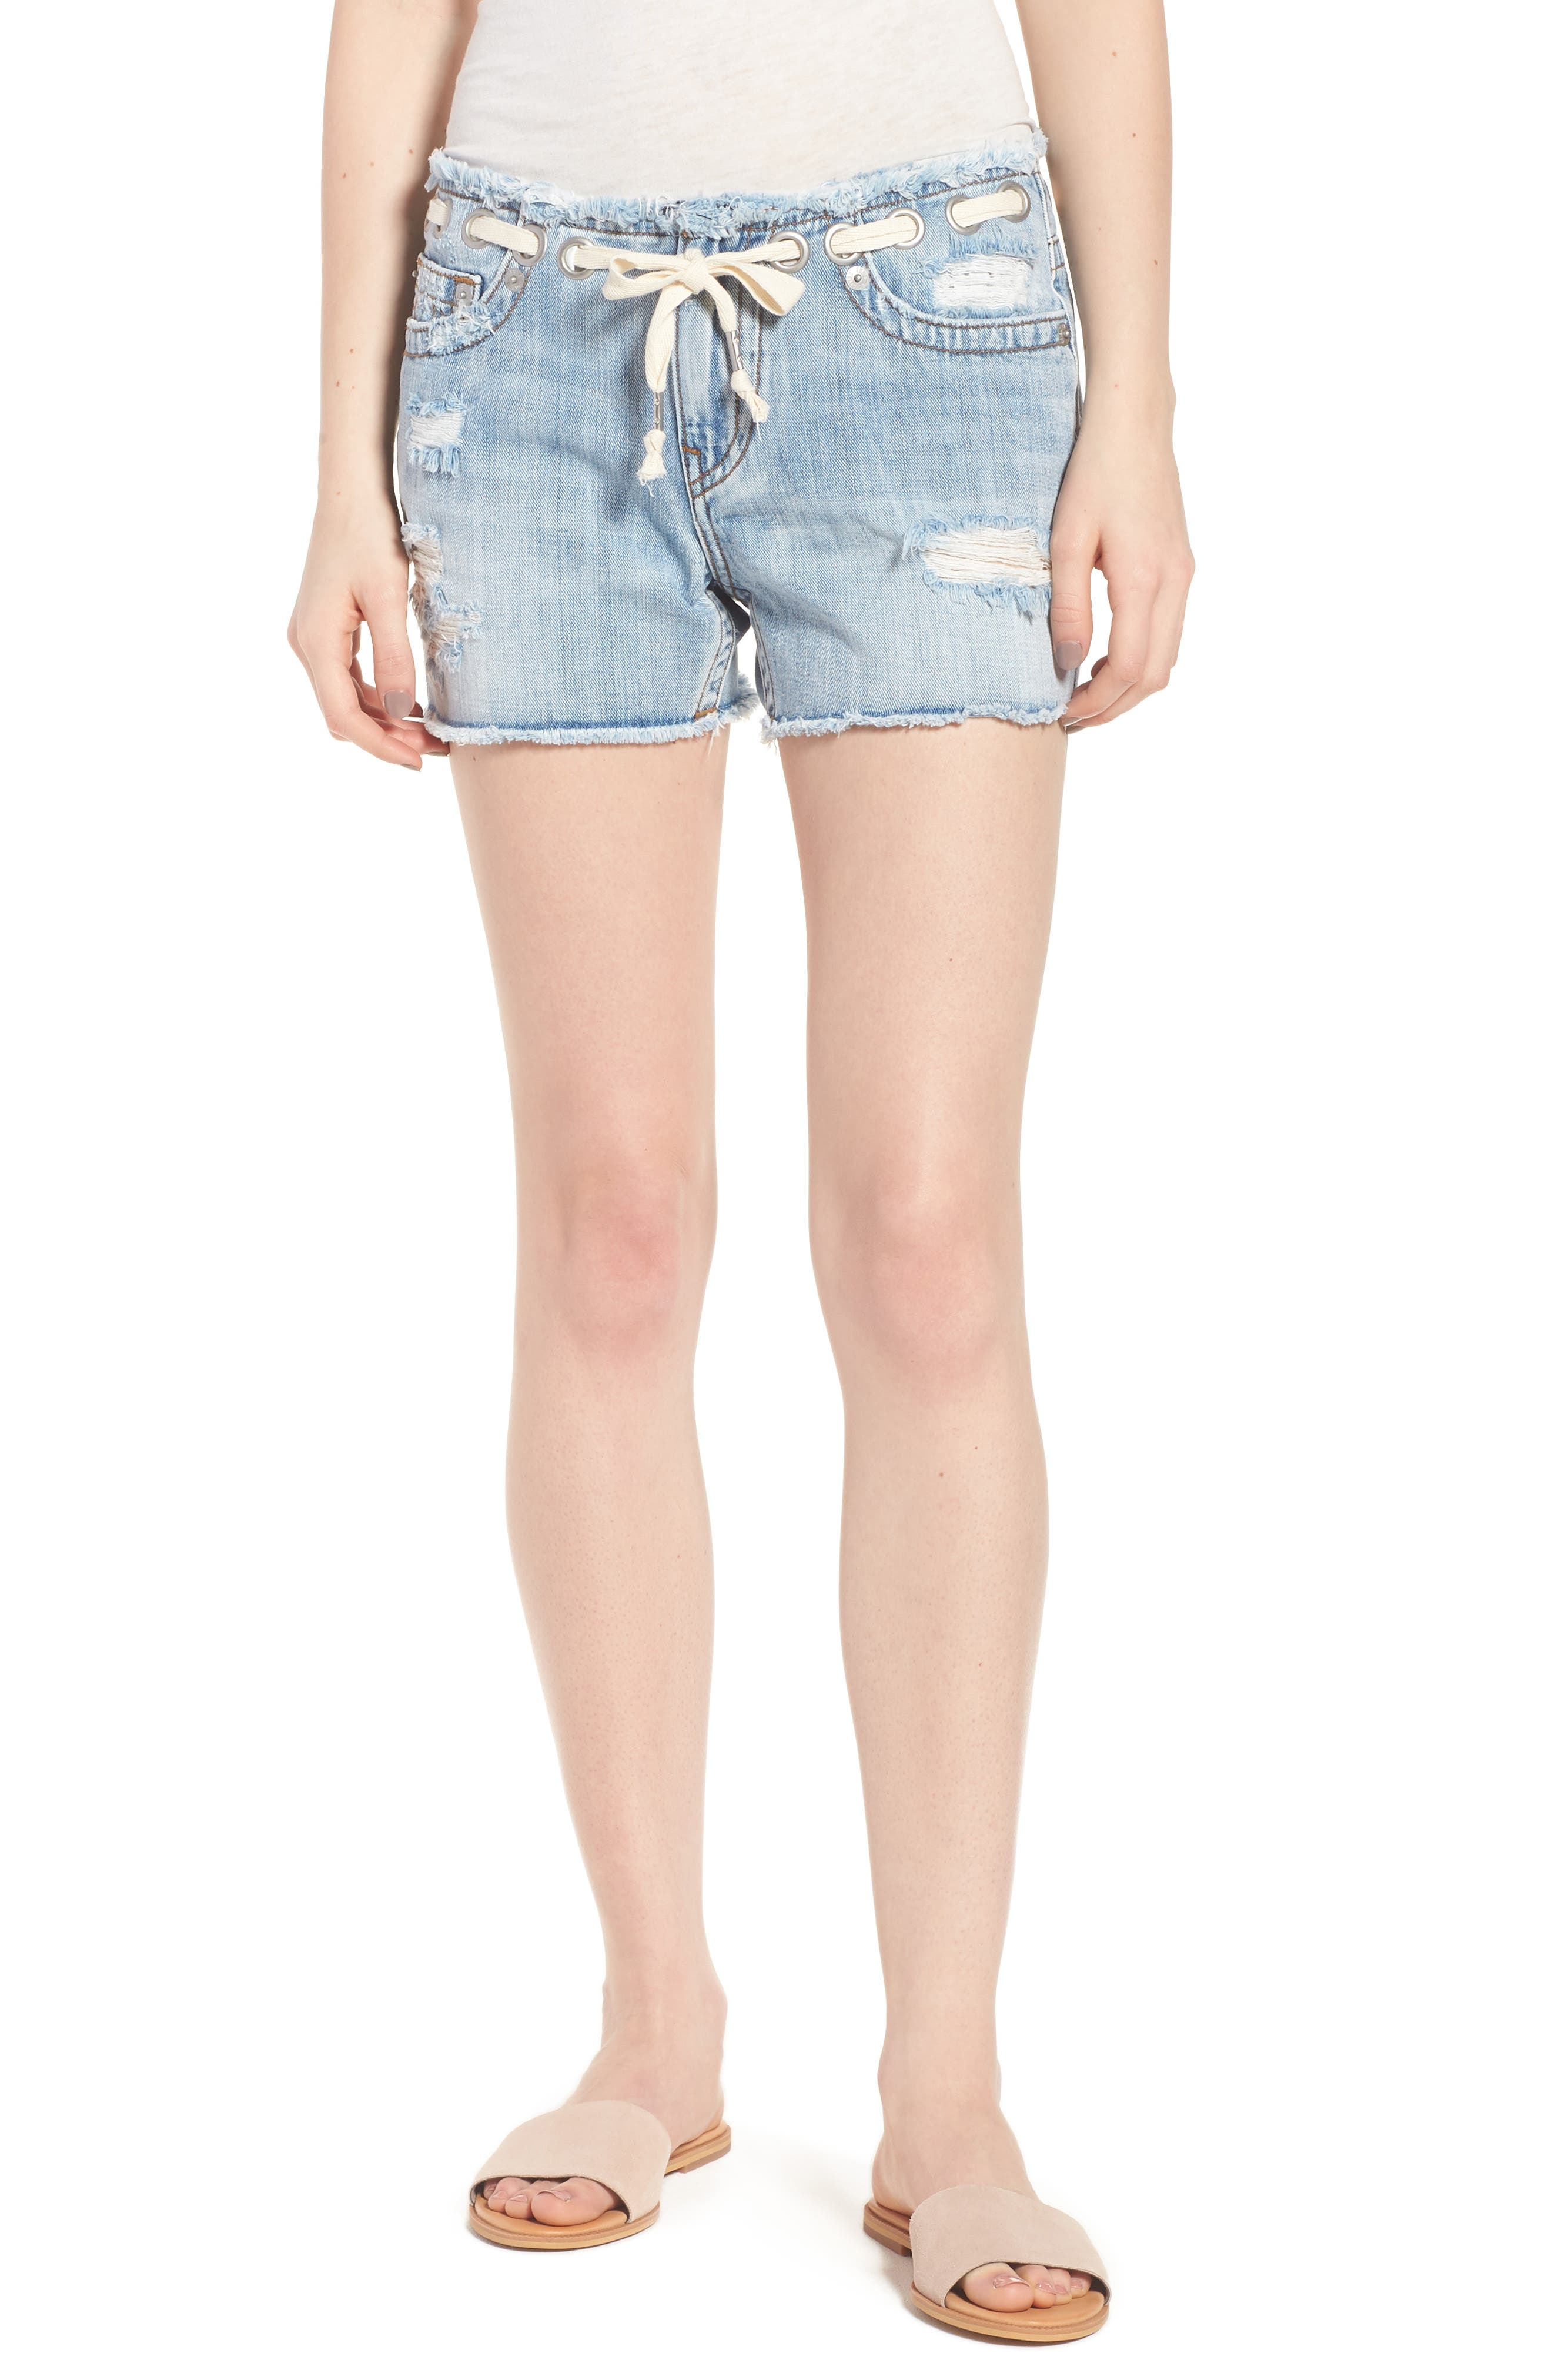 True Religion Brand Jeans Fashion Distressed Denim Shorts (Baseline Destroy)